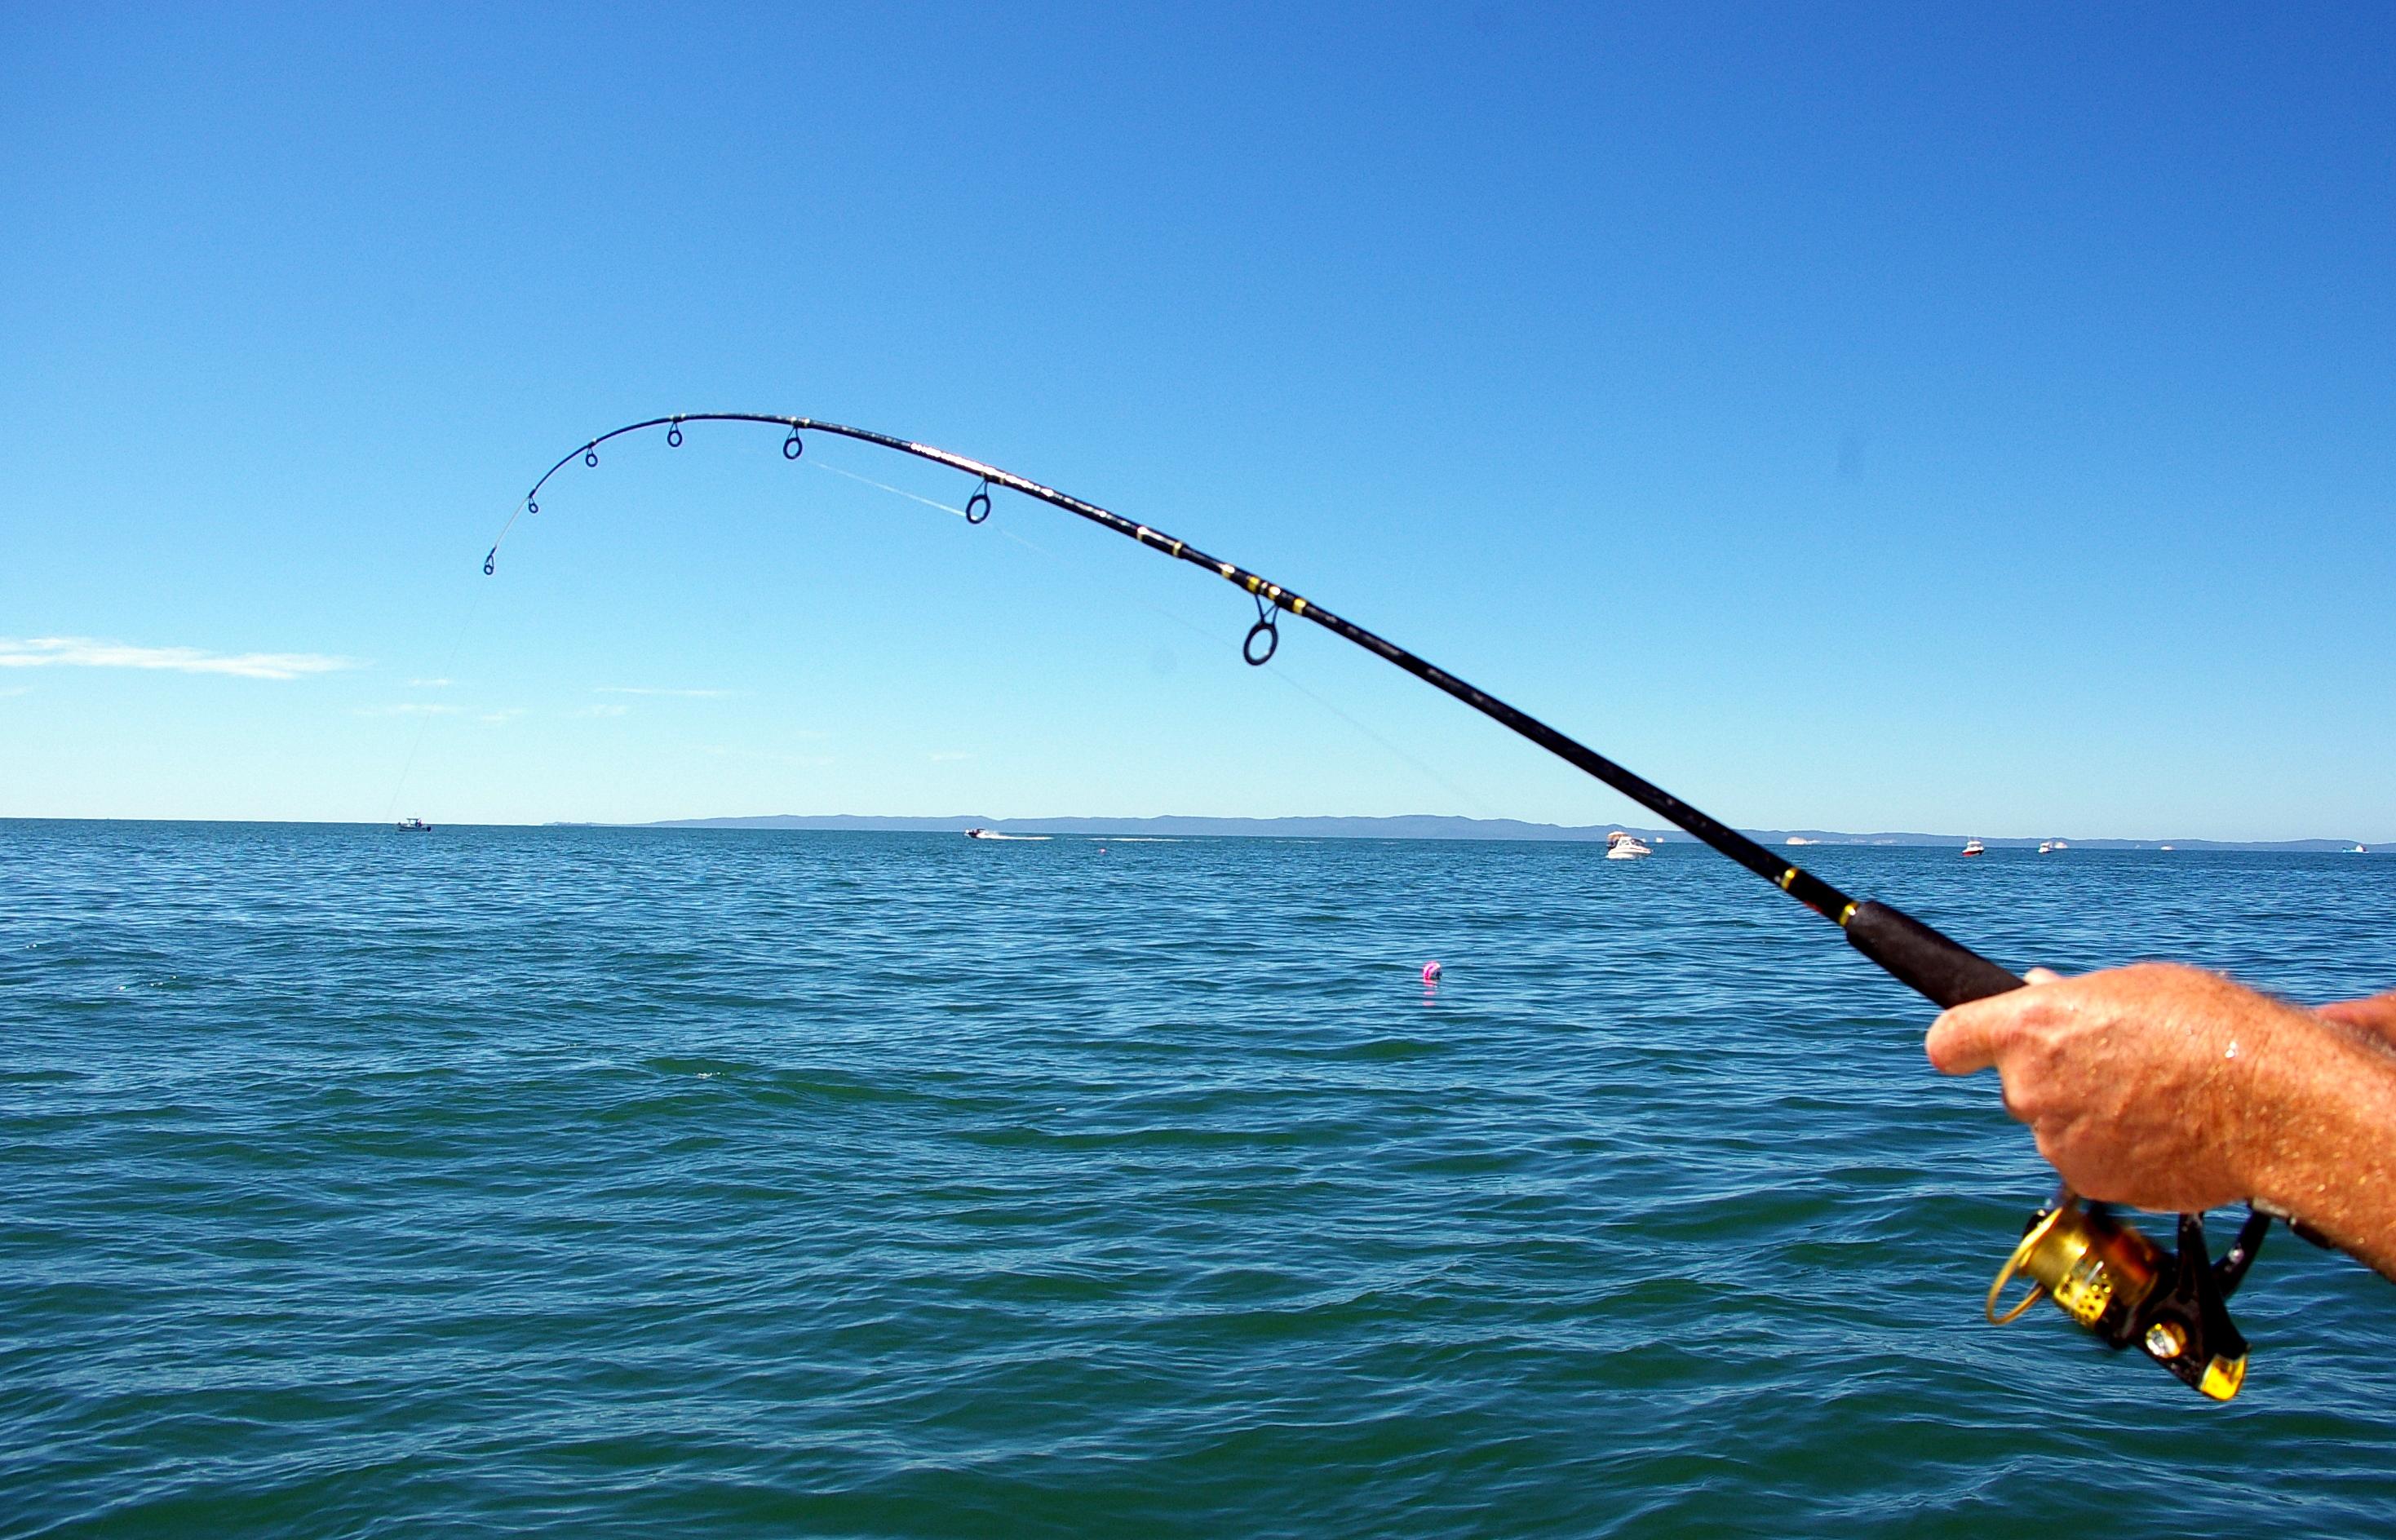 rod tip bent while fishing